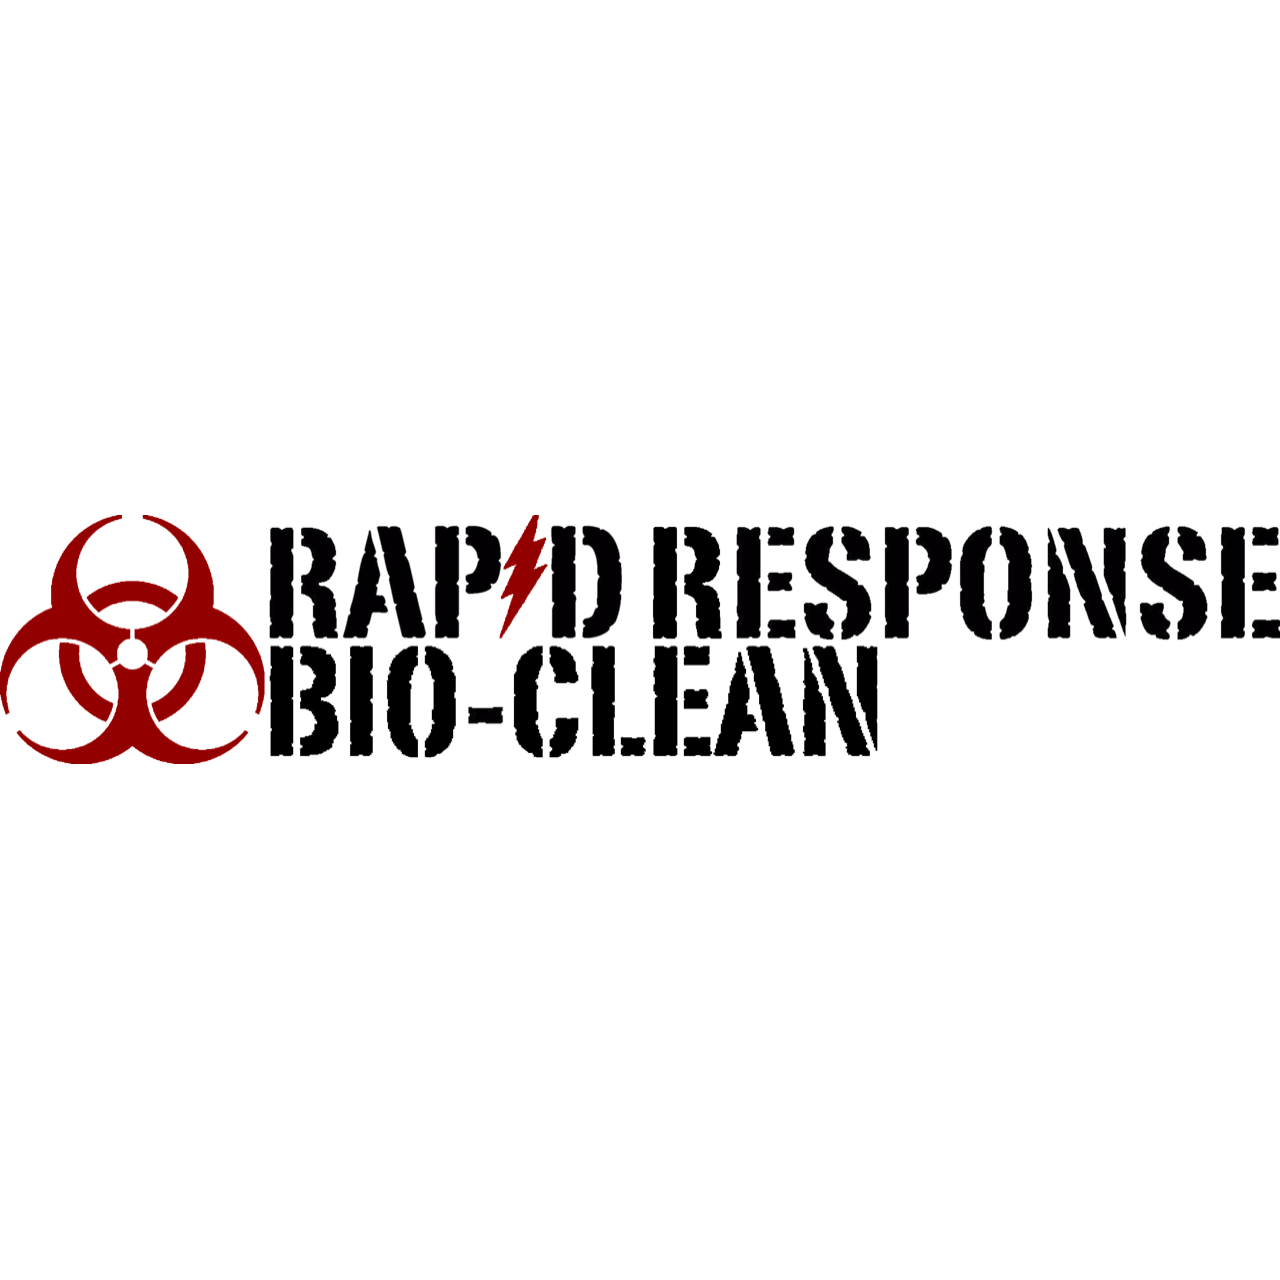 Rapid Response Bio Clean LLC